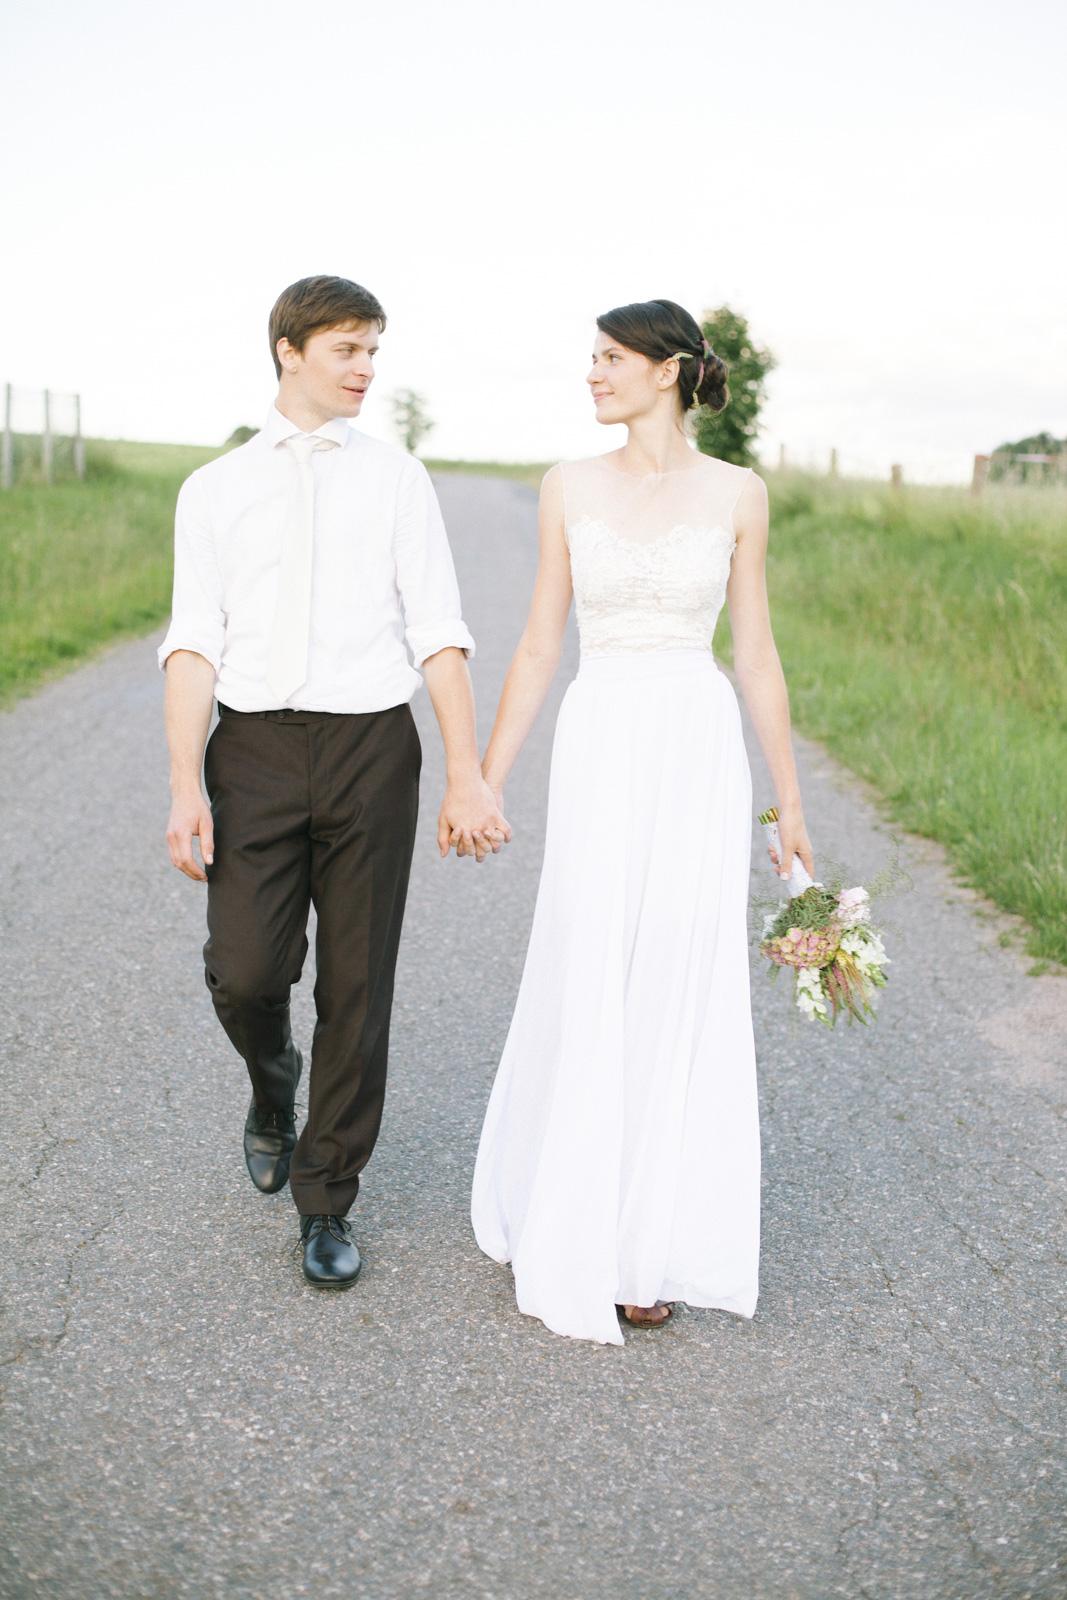 Bohemian Summer Countryside Wedding Photoshoot by Ceranna Photography - Scottish Alternative and Destination Wedding Photographer | Česká svatba